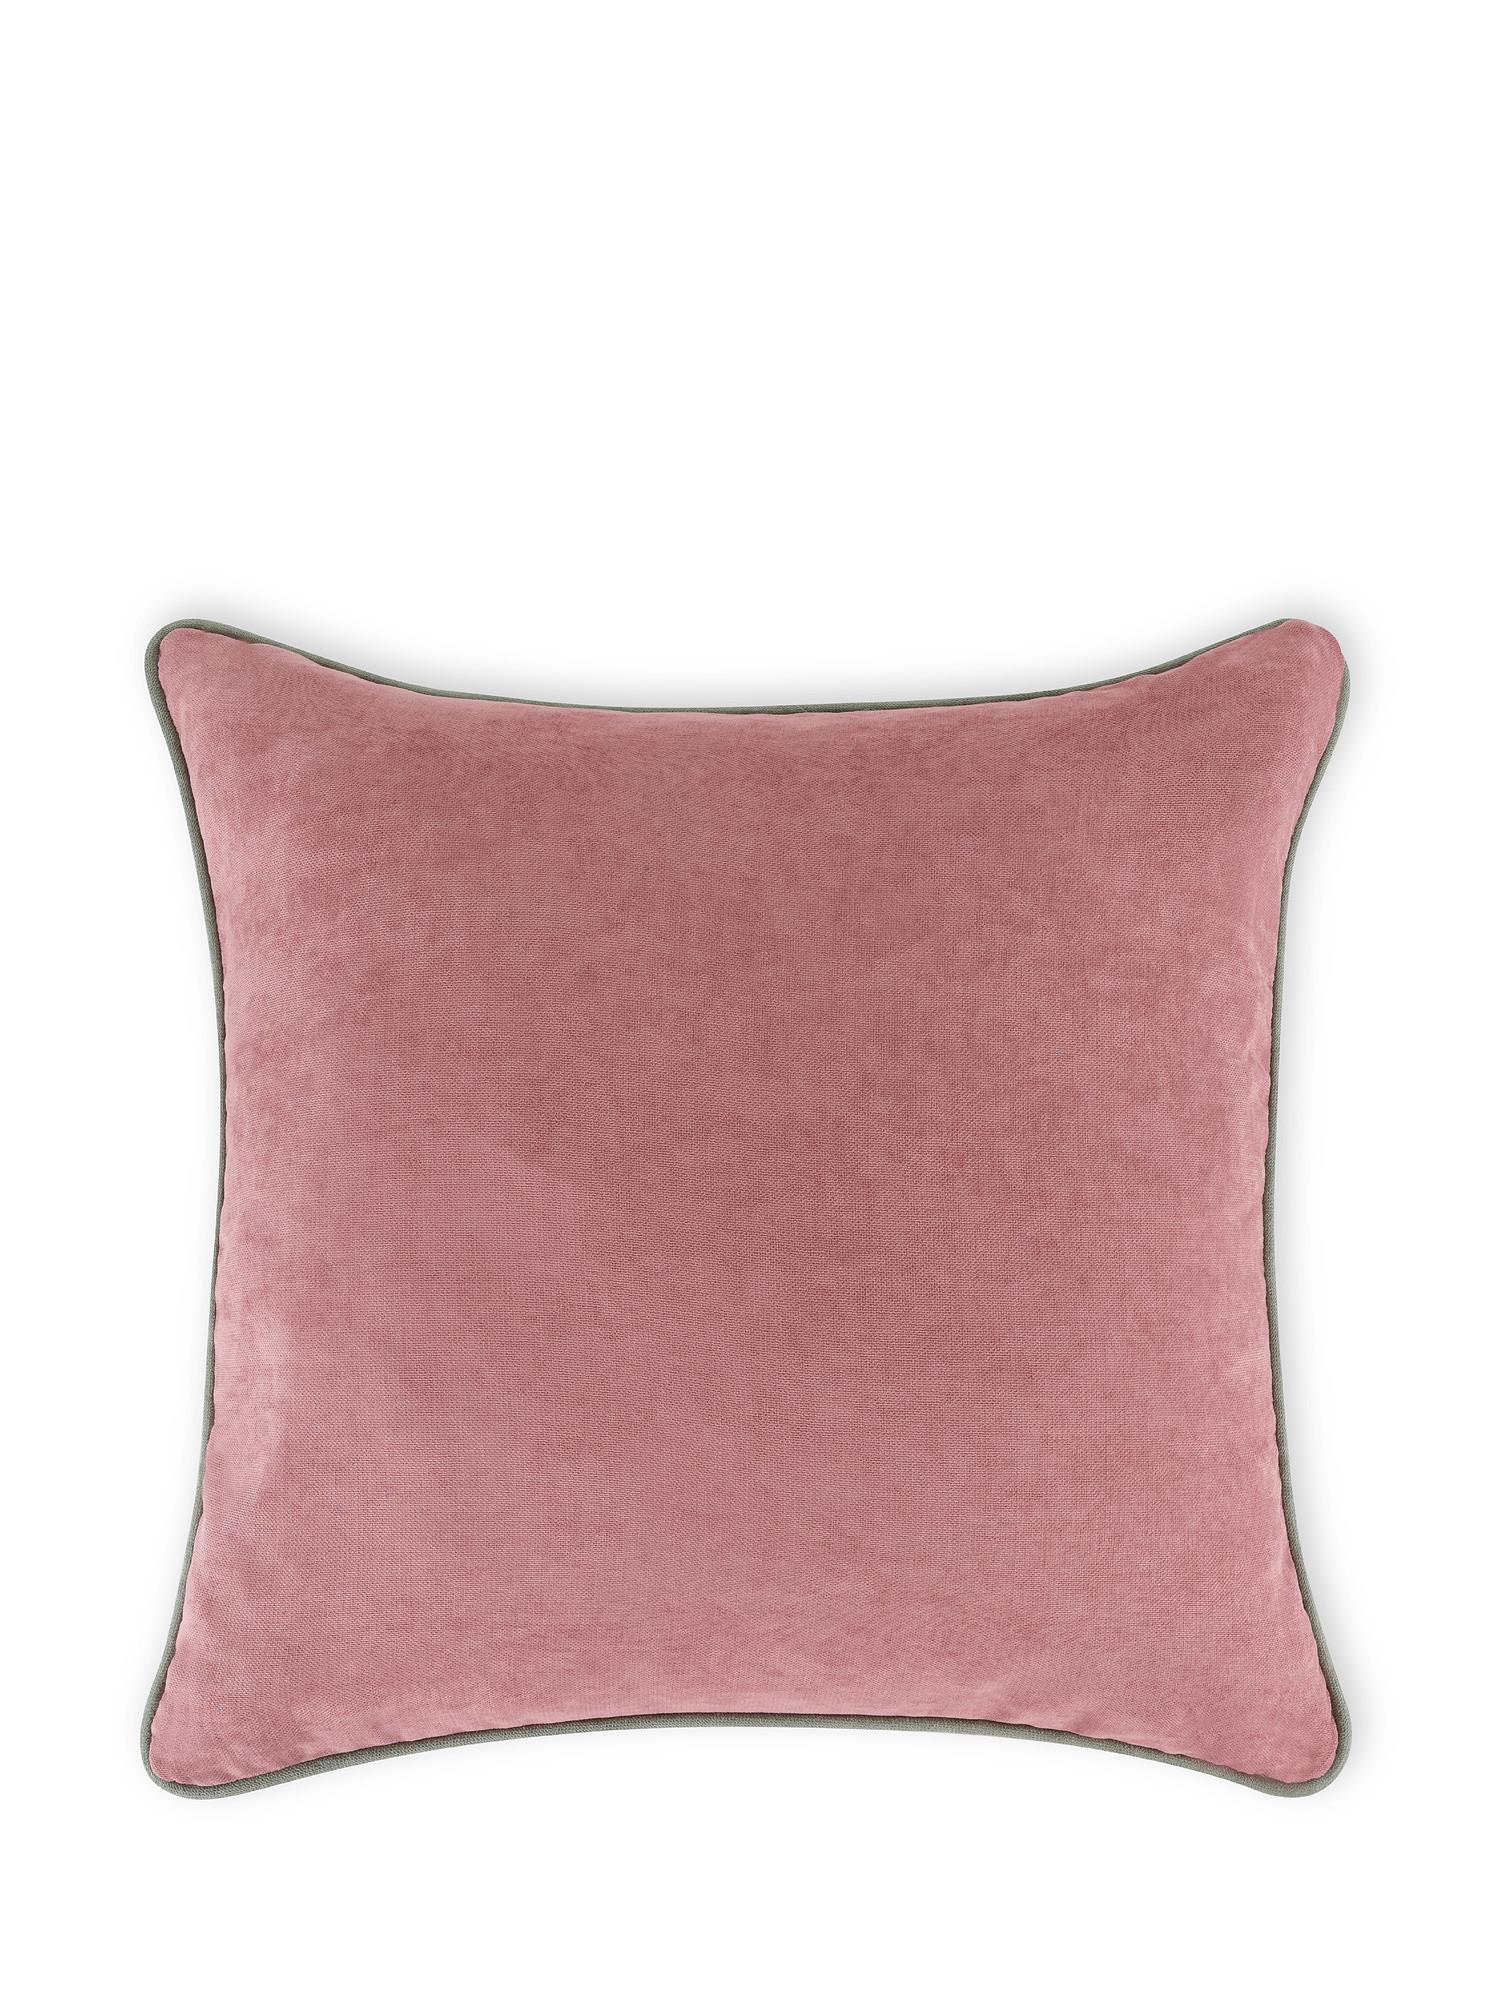 Cuscino tessuto effetto mélange 50x50cm, Rosa, large image number 1